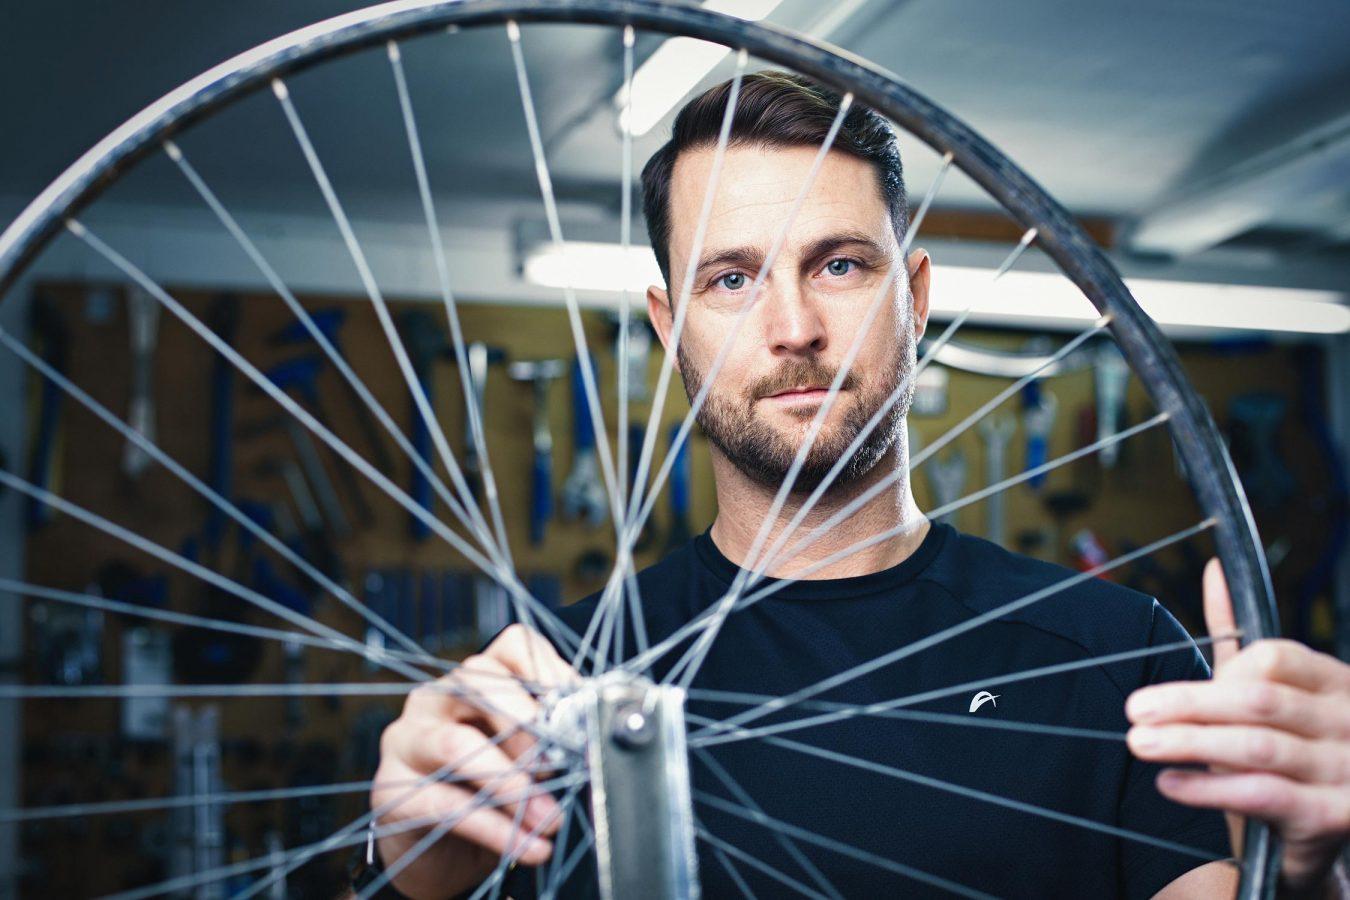 portrait-advertising-photography-bikeshop-man-cambridge